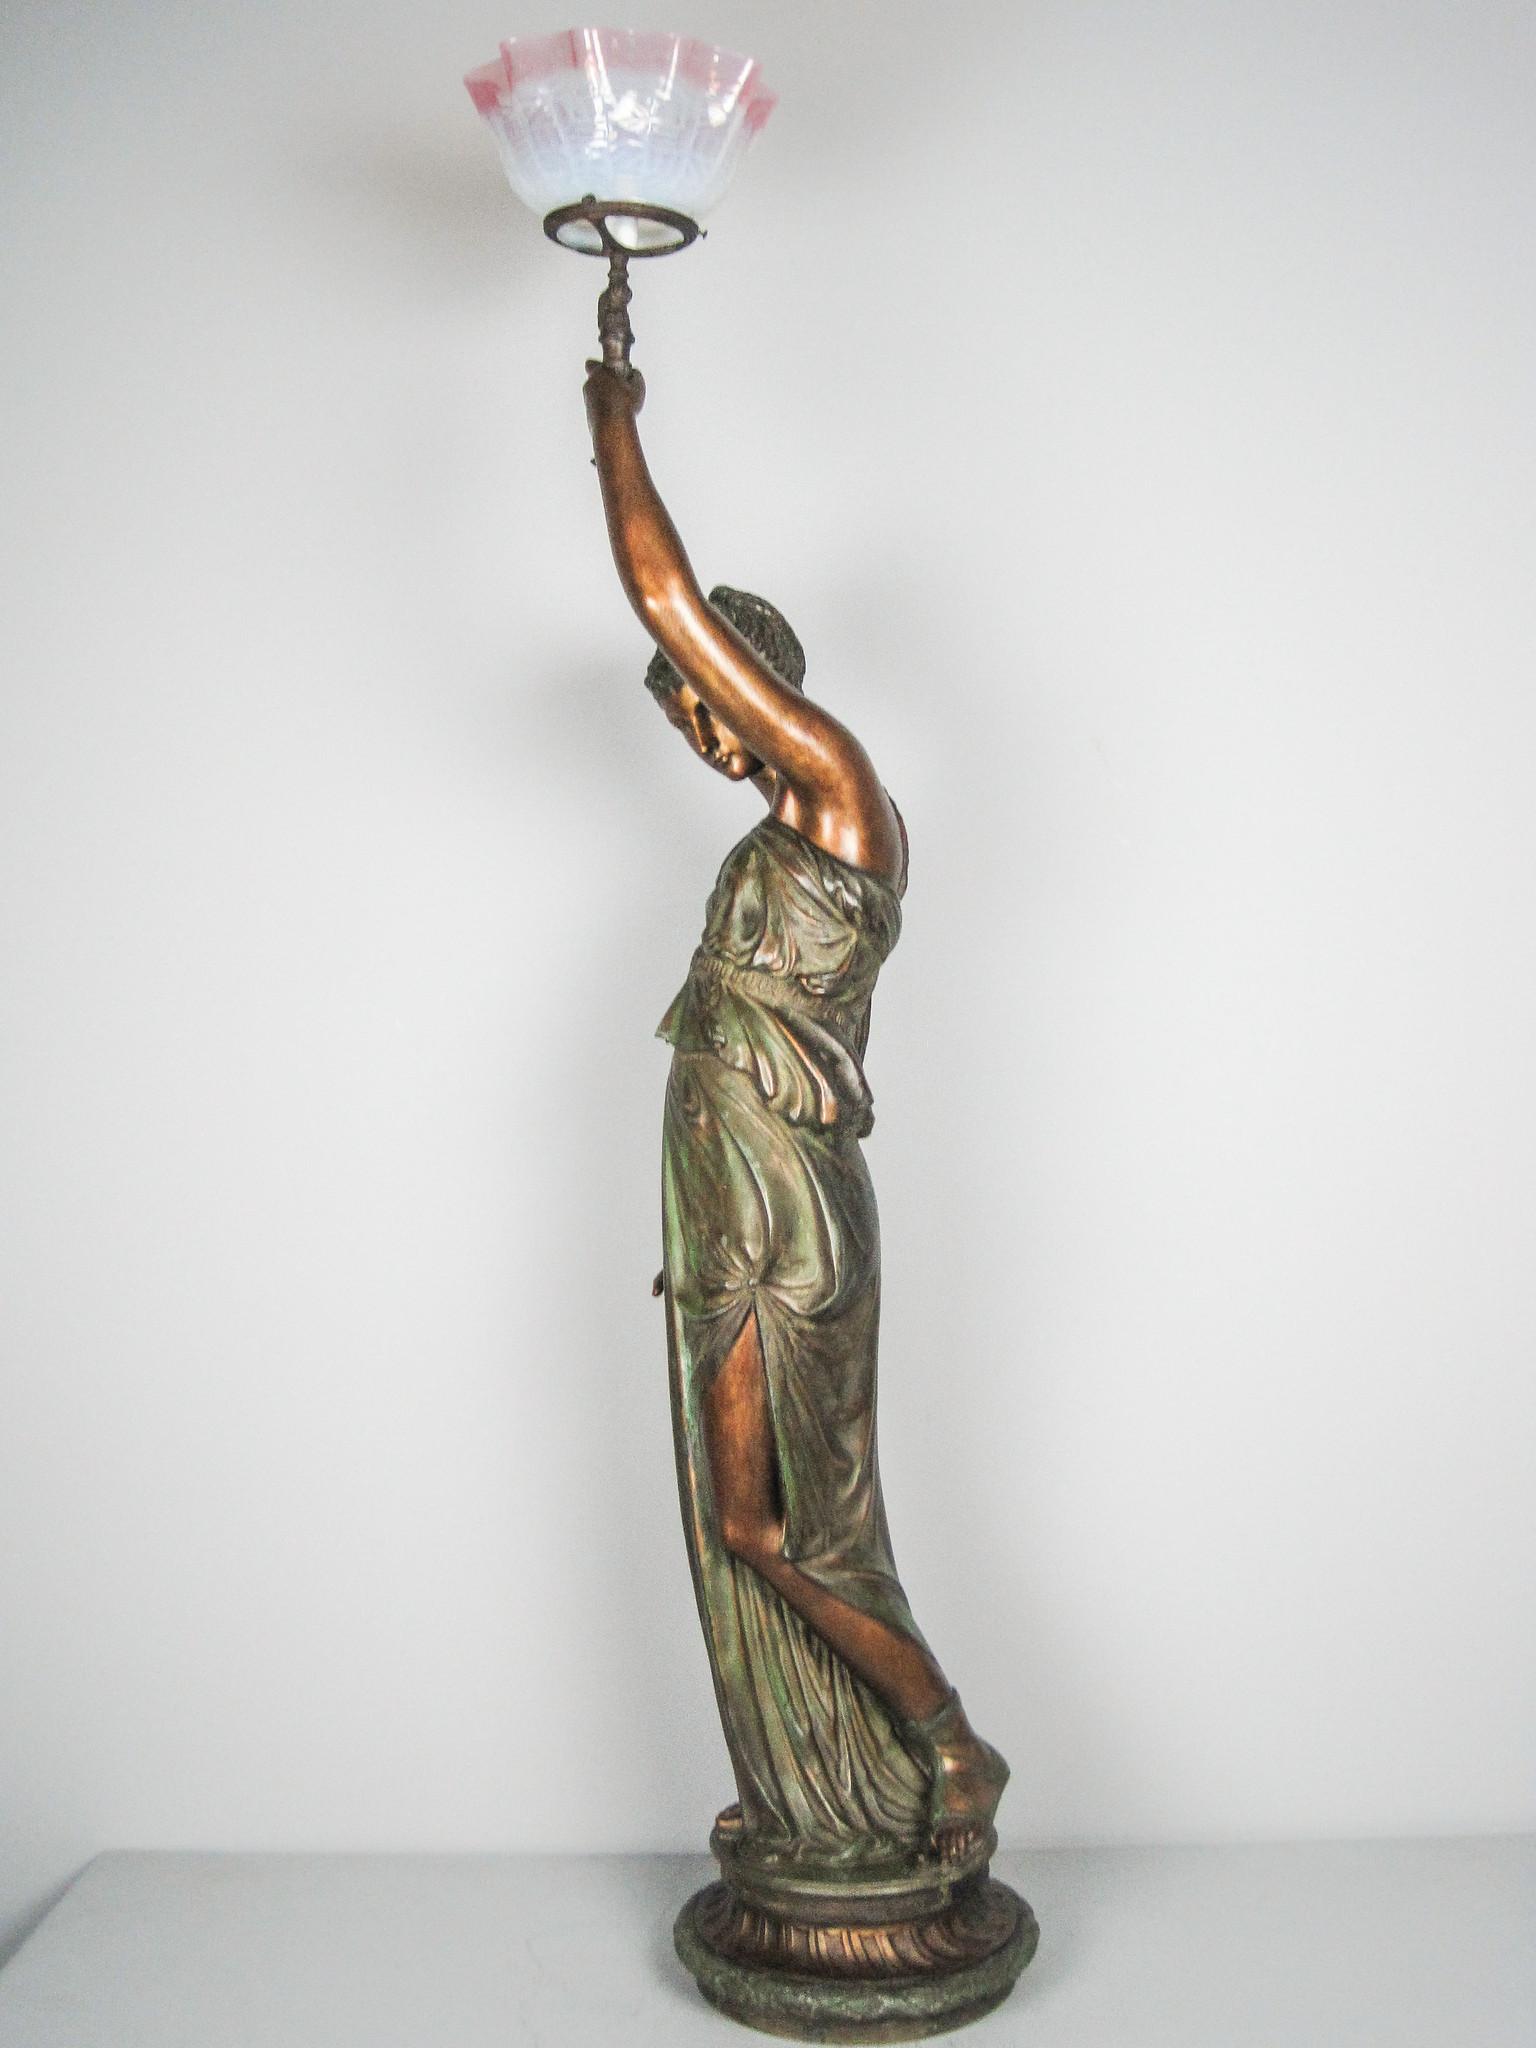 Mitchell Vance Amp Co Goddess Newel Post Lamp